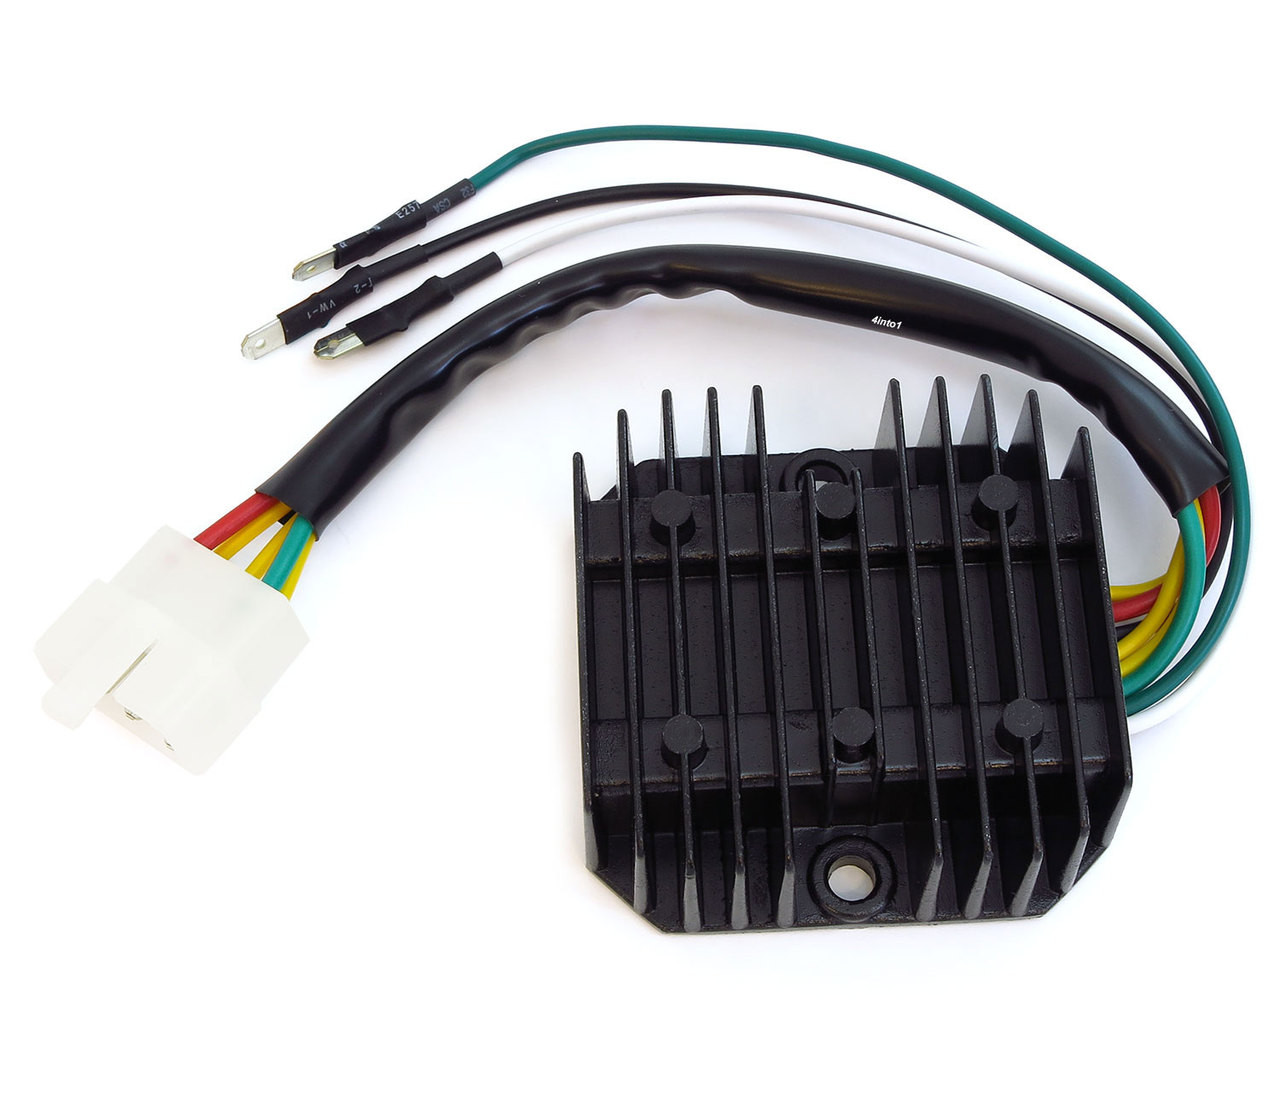 Rectifier Regulator Honda Cb 750 Wiring Diagram Trusted Schematics Cb750f Cb350f Cb400f Cb500 Cb550 Cb750 900